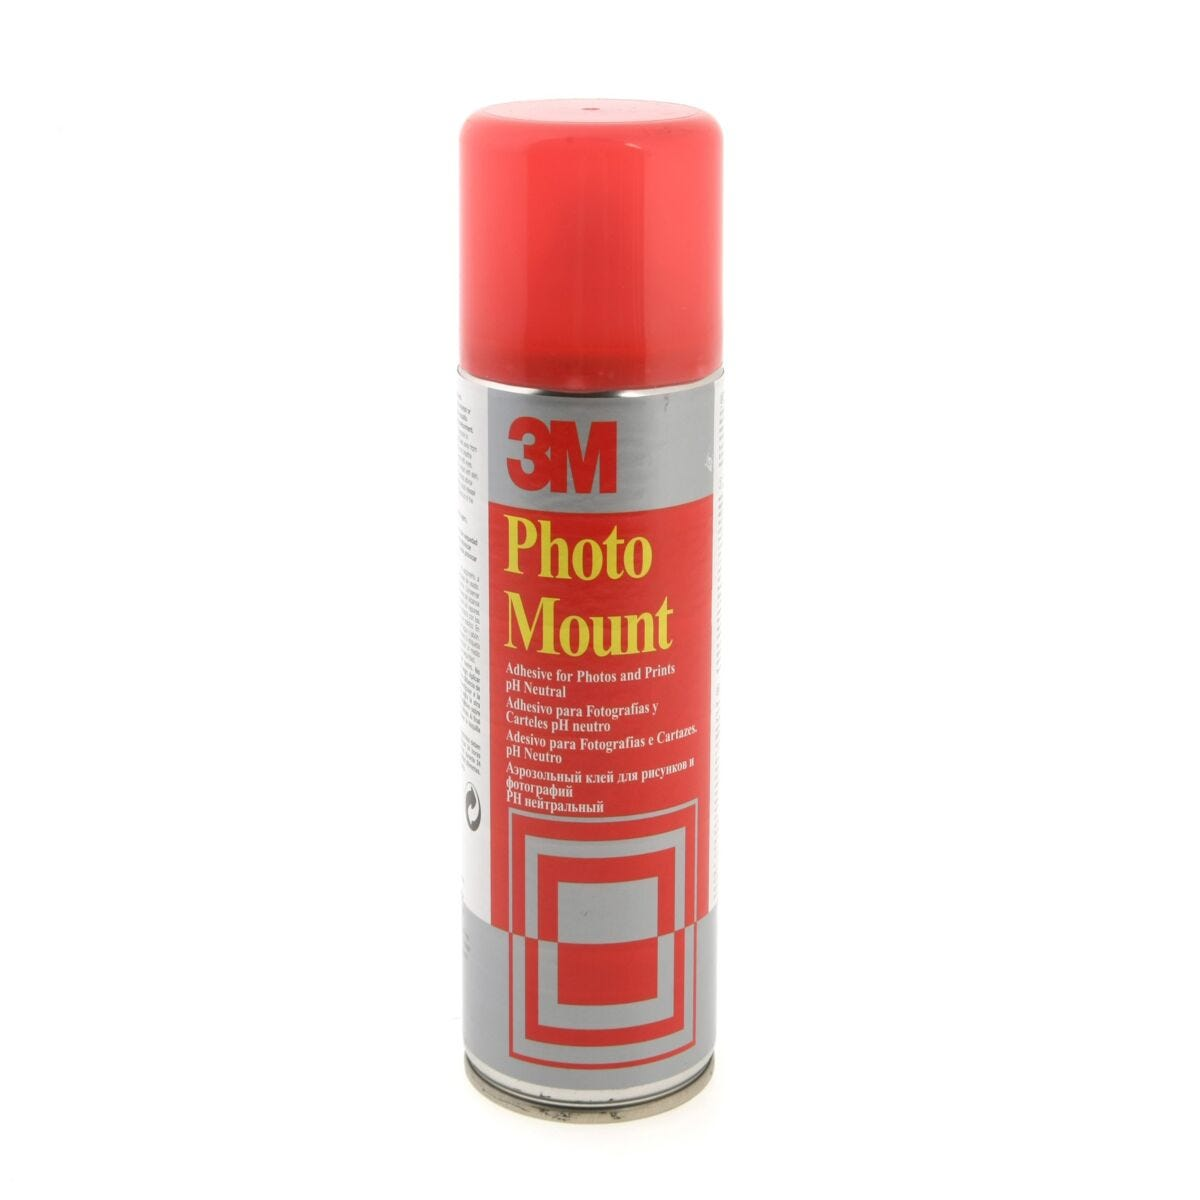 3M Photomount 400ml Strong Adhesive